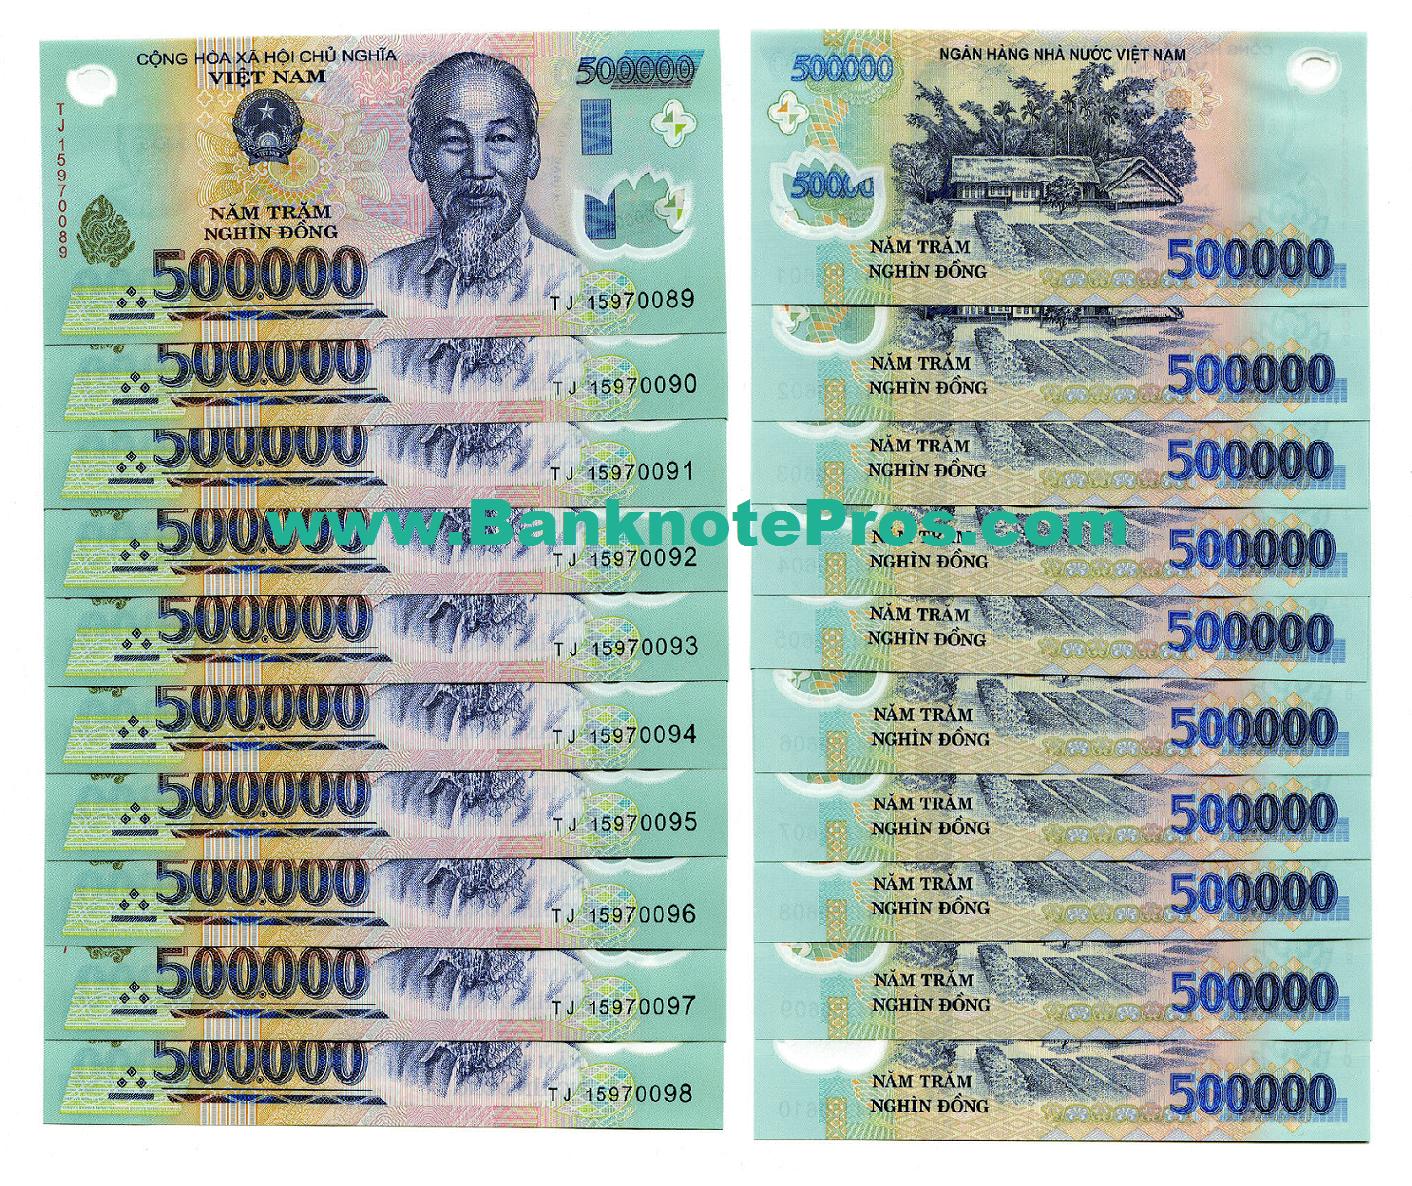 5 Million Vietnam Dong 500k Notes Circulated